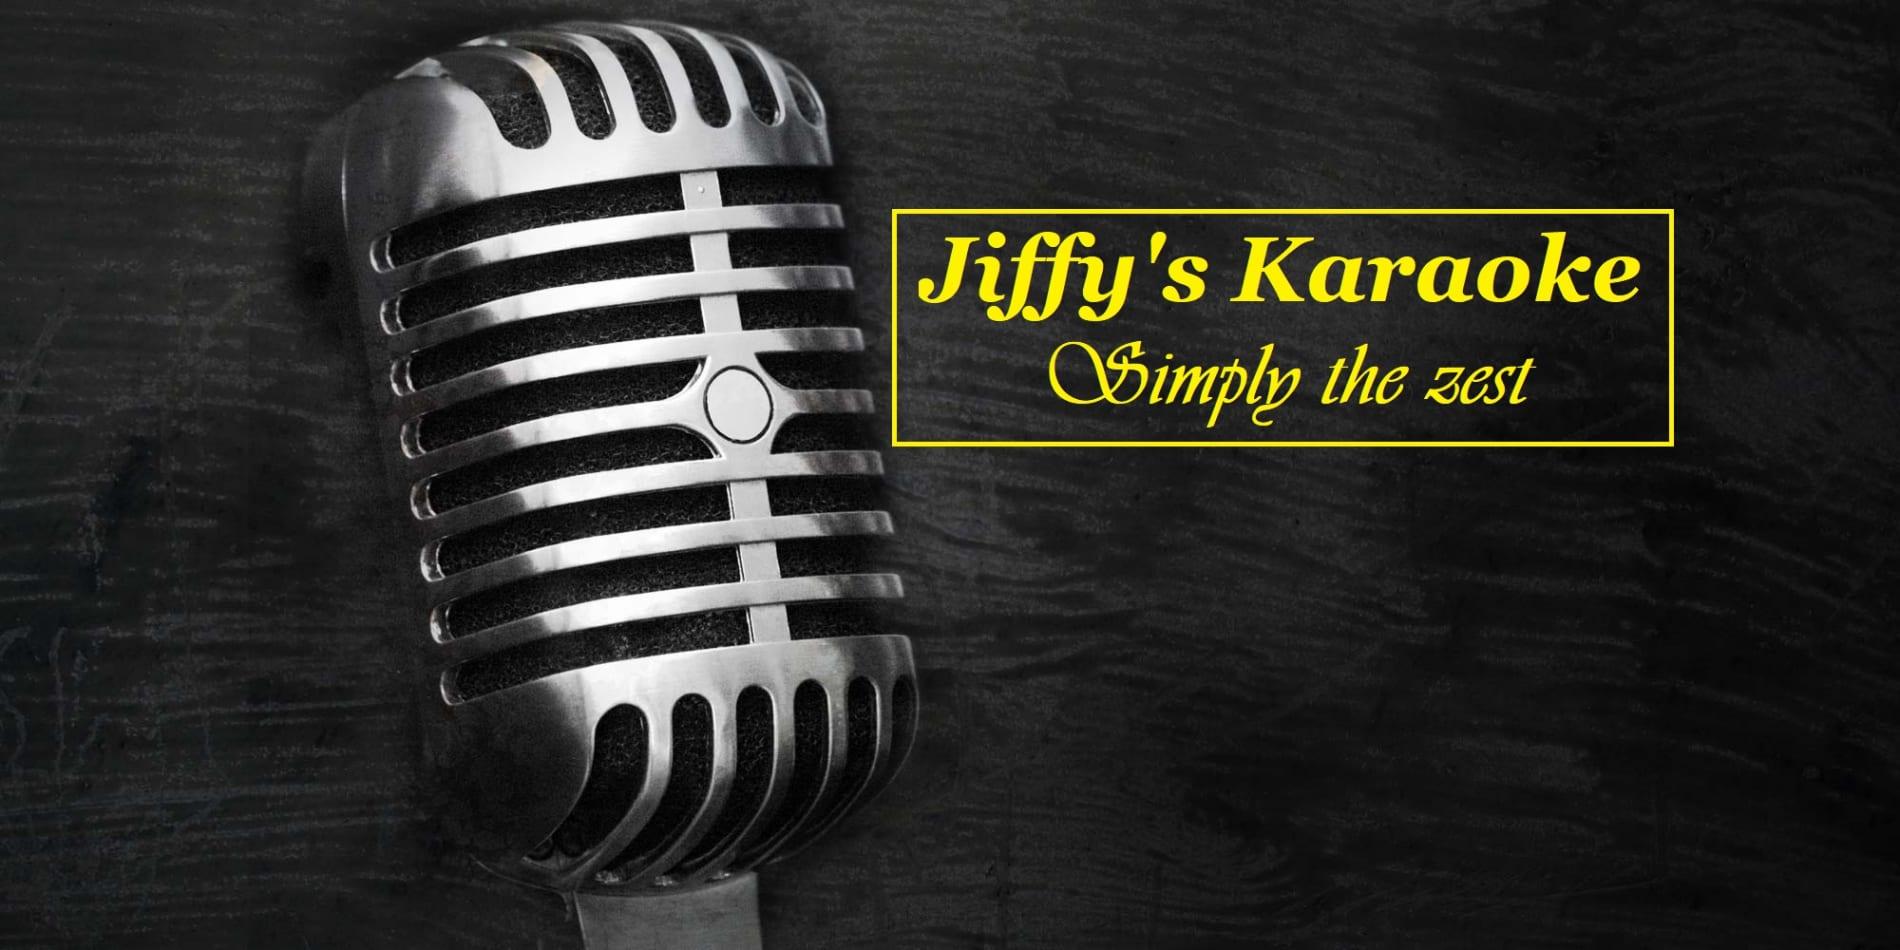 Jiffy's Karaoke